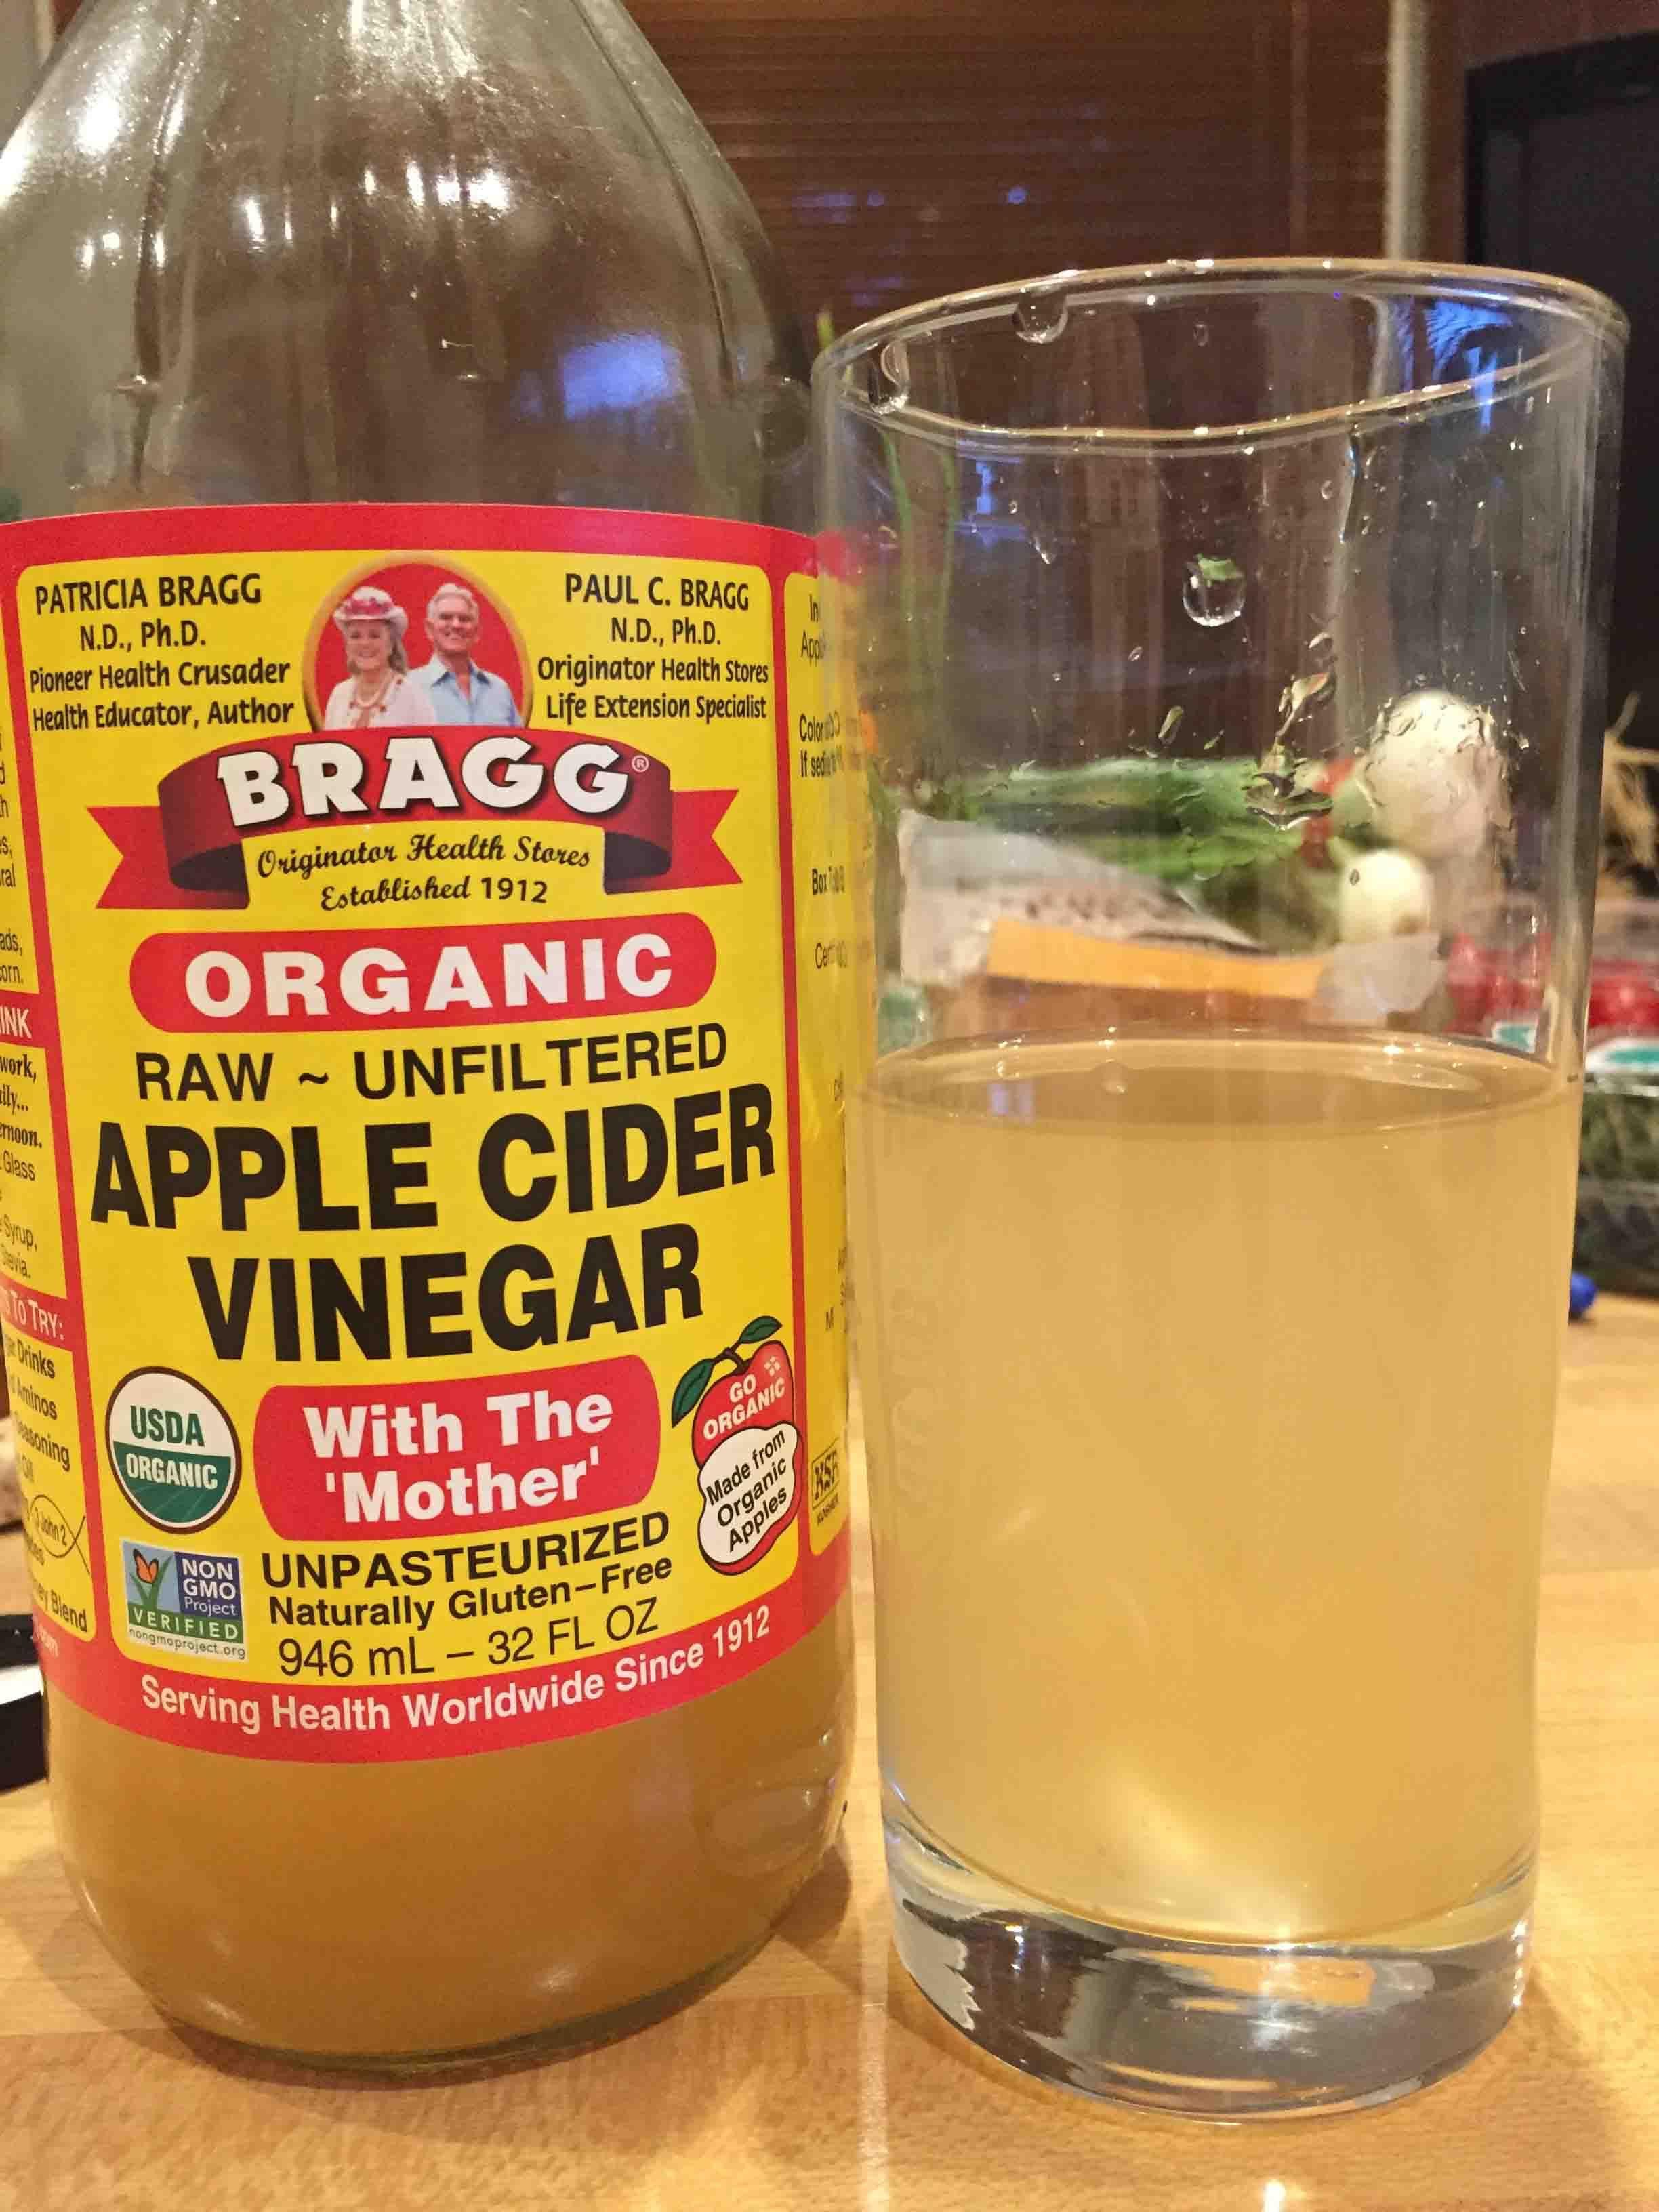 using apple cider vinegar for gout maintenance is fantastic. gout